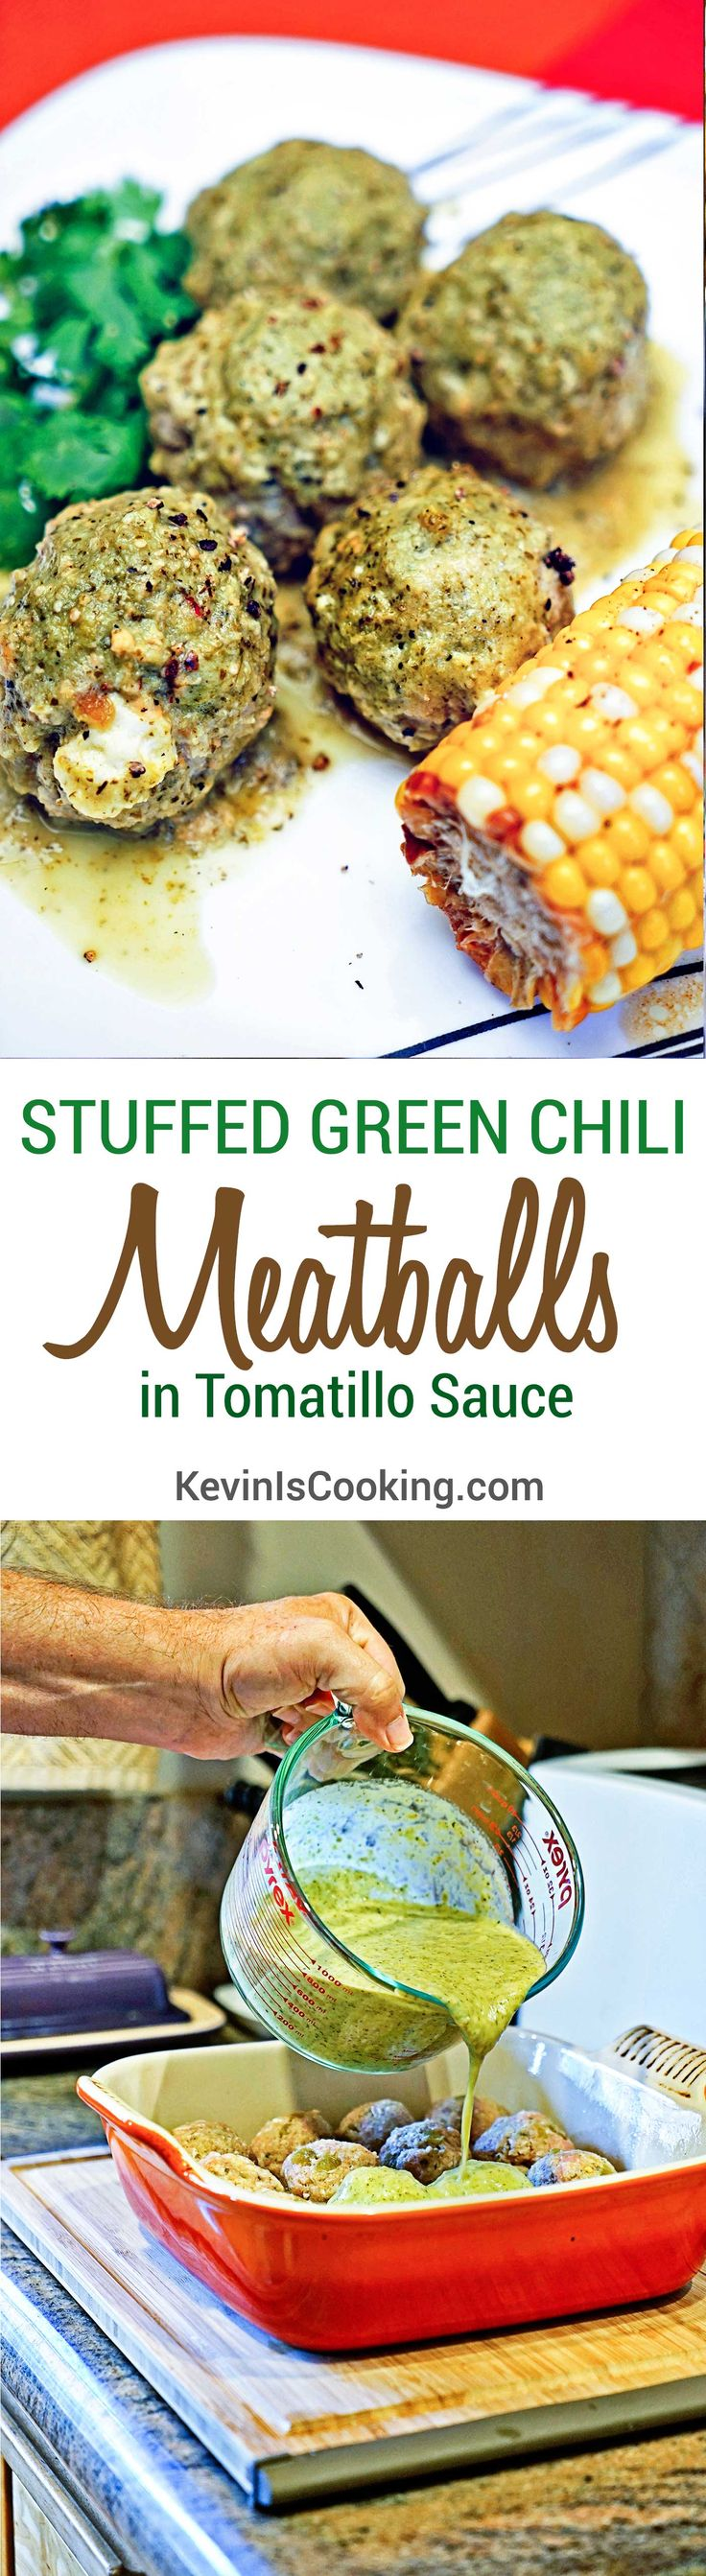 Stuffed Green Chili Meatballs in Tomatillo Sauce. .